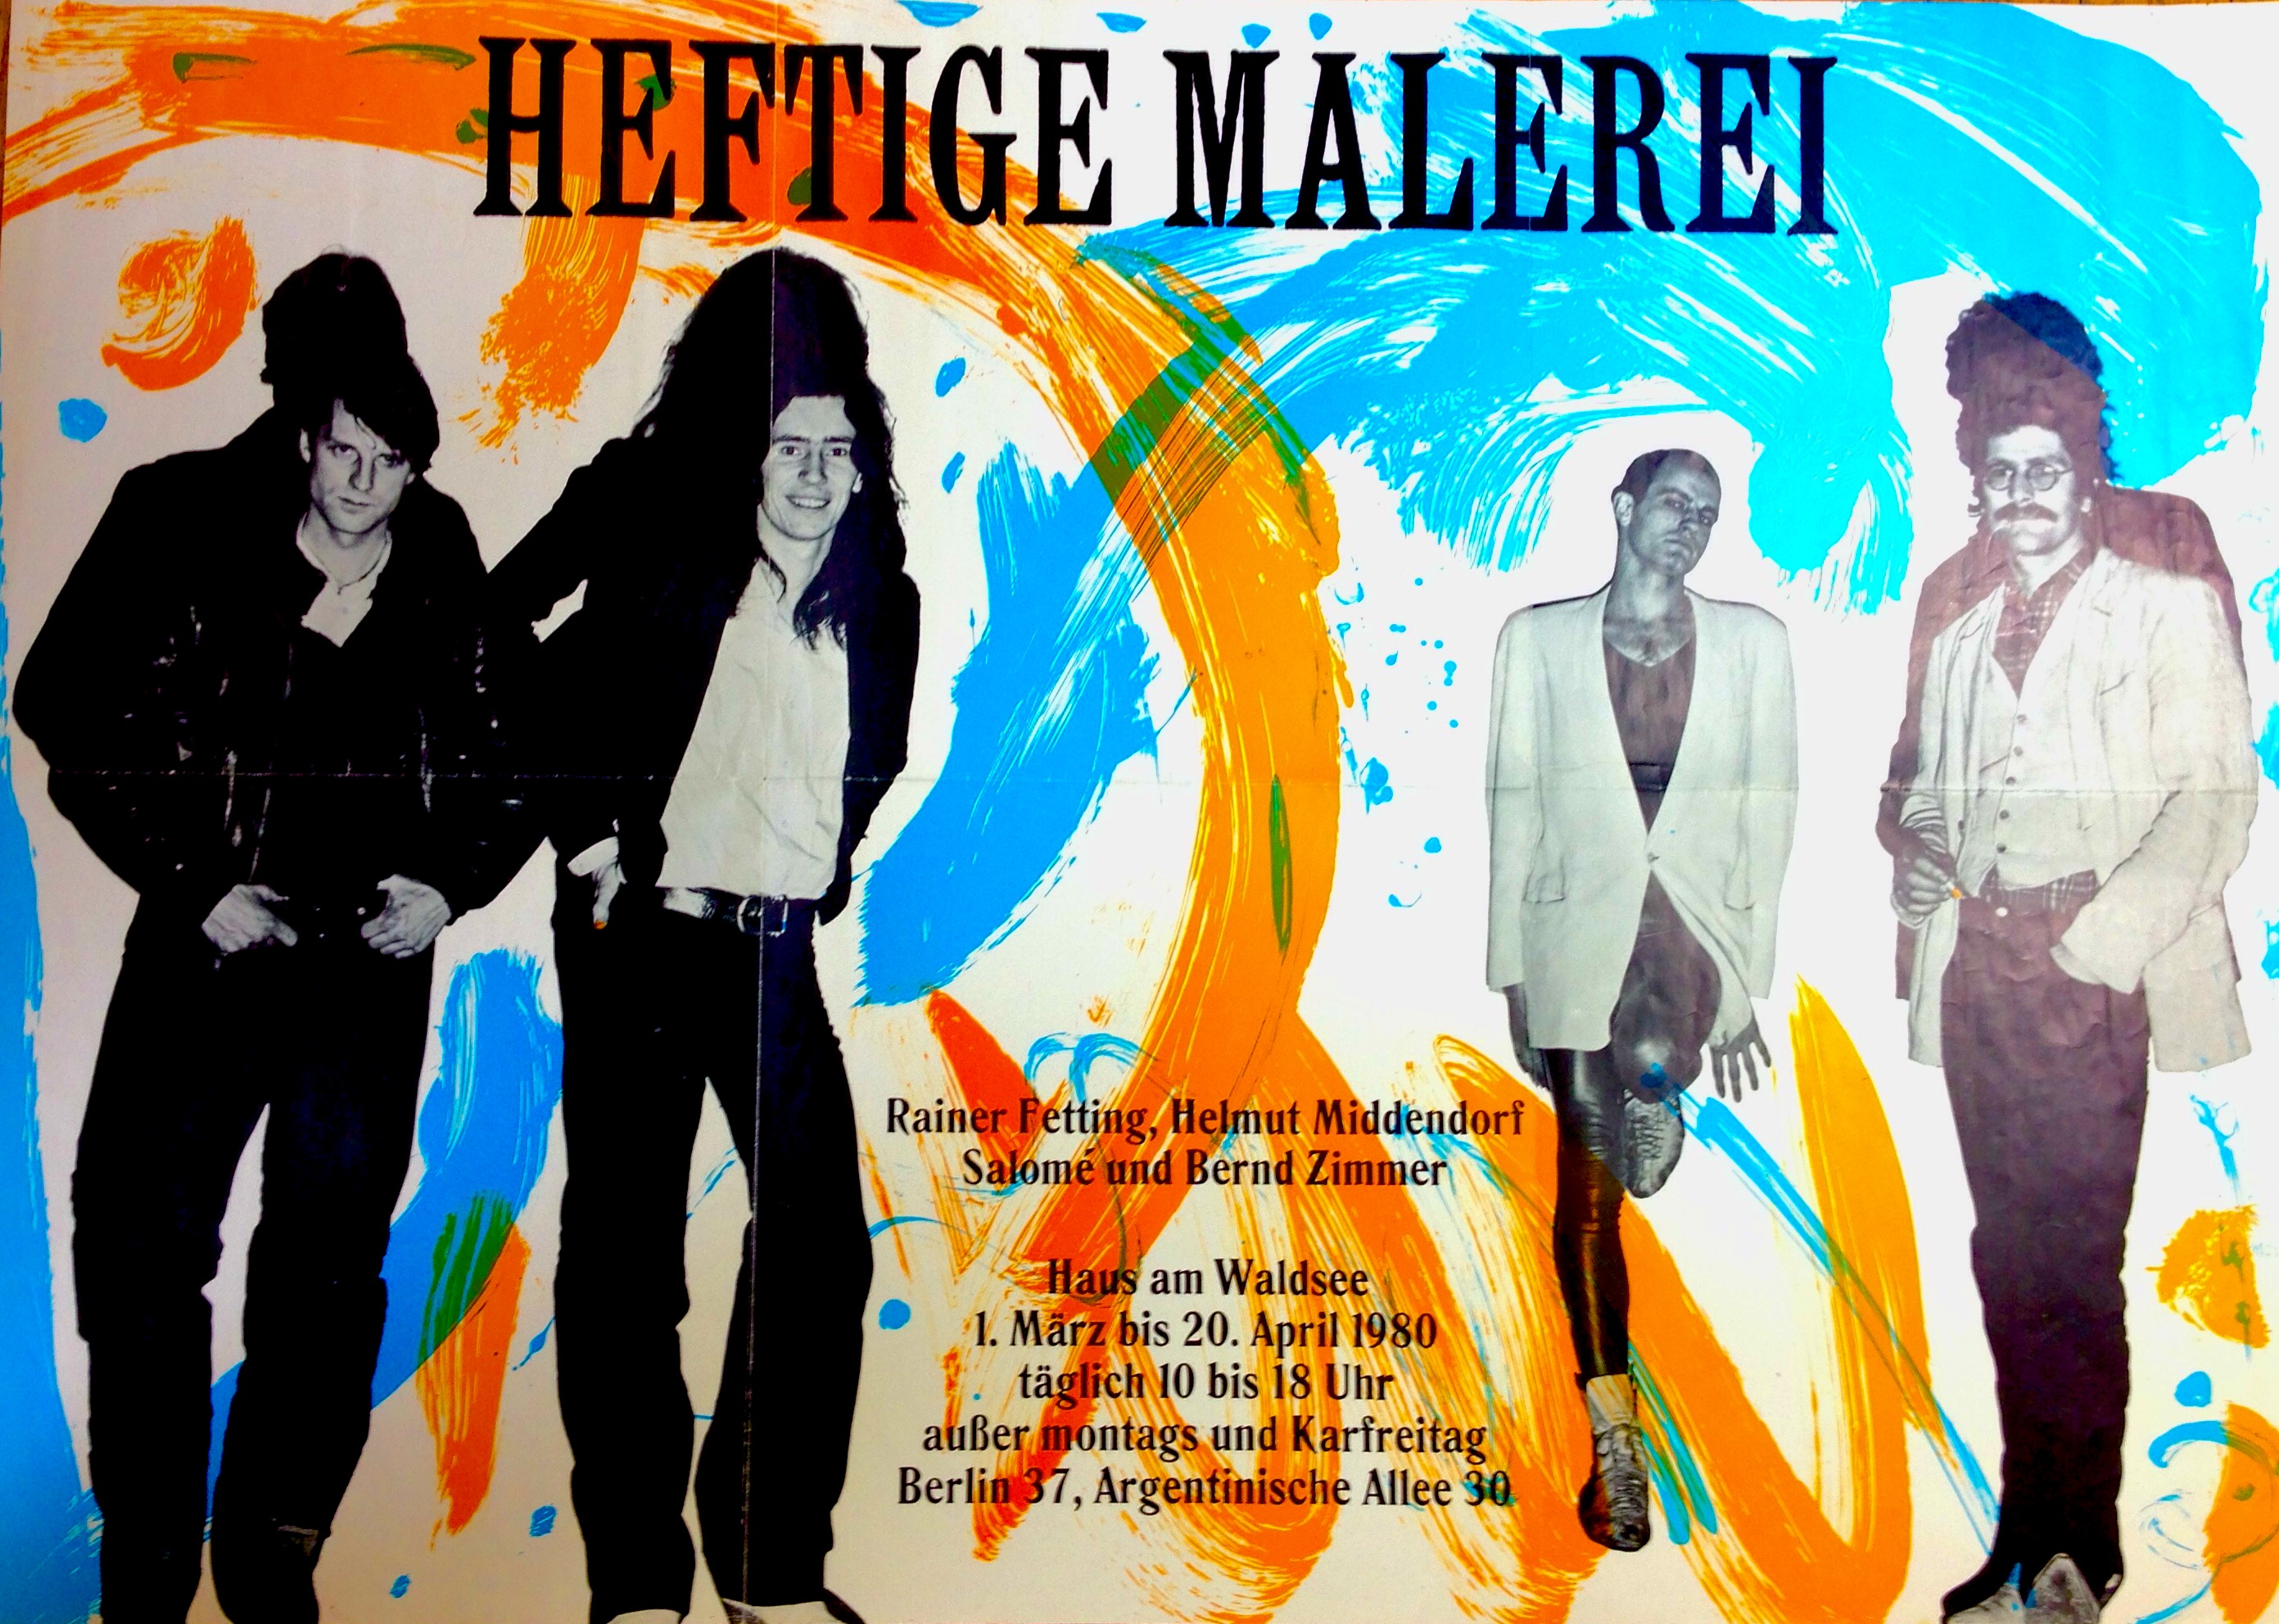 Heftige Malerei. Haus Am Waldsee, Berlin, 1. März U2013 20.April 1980